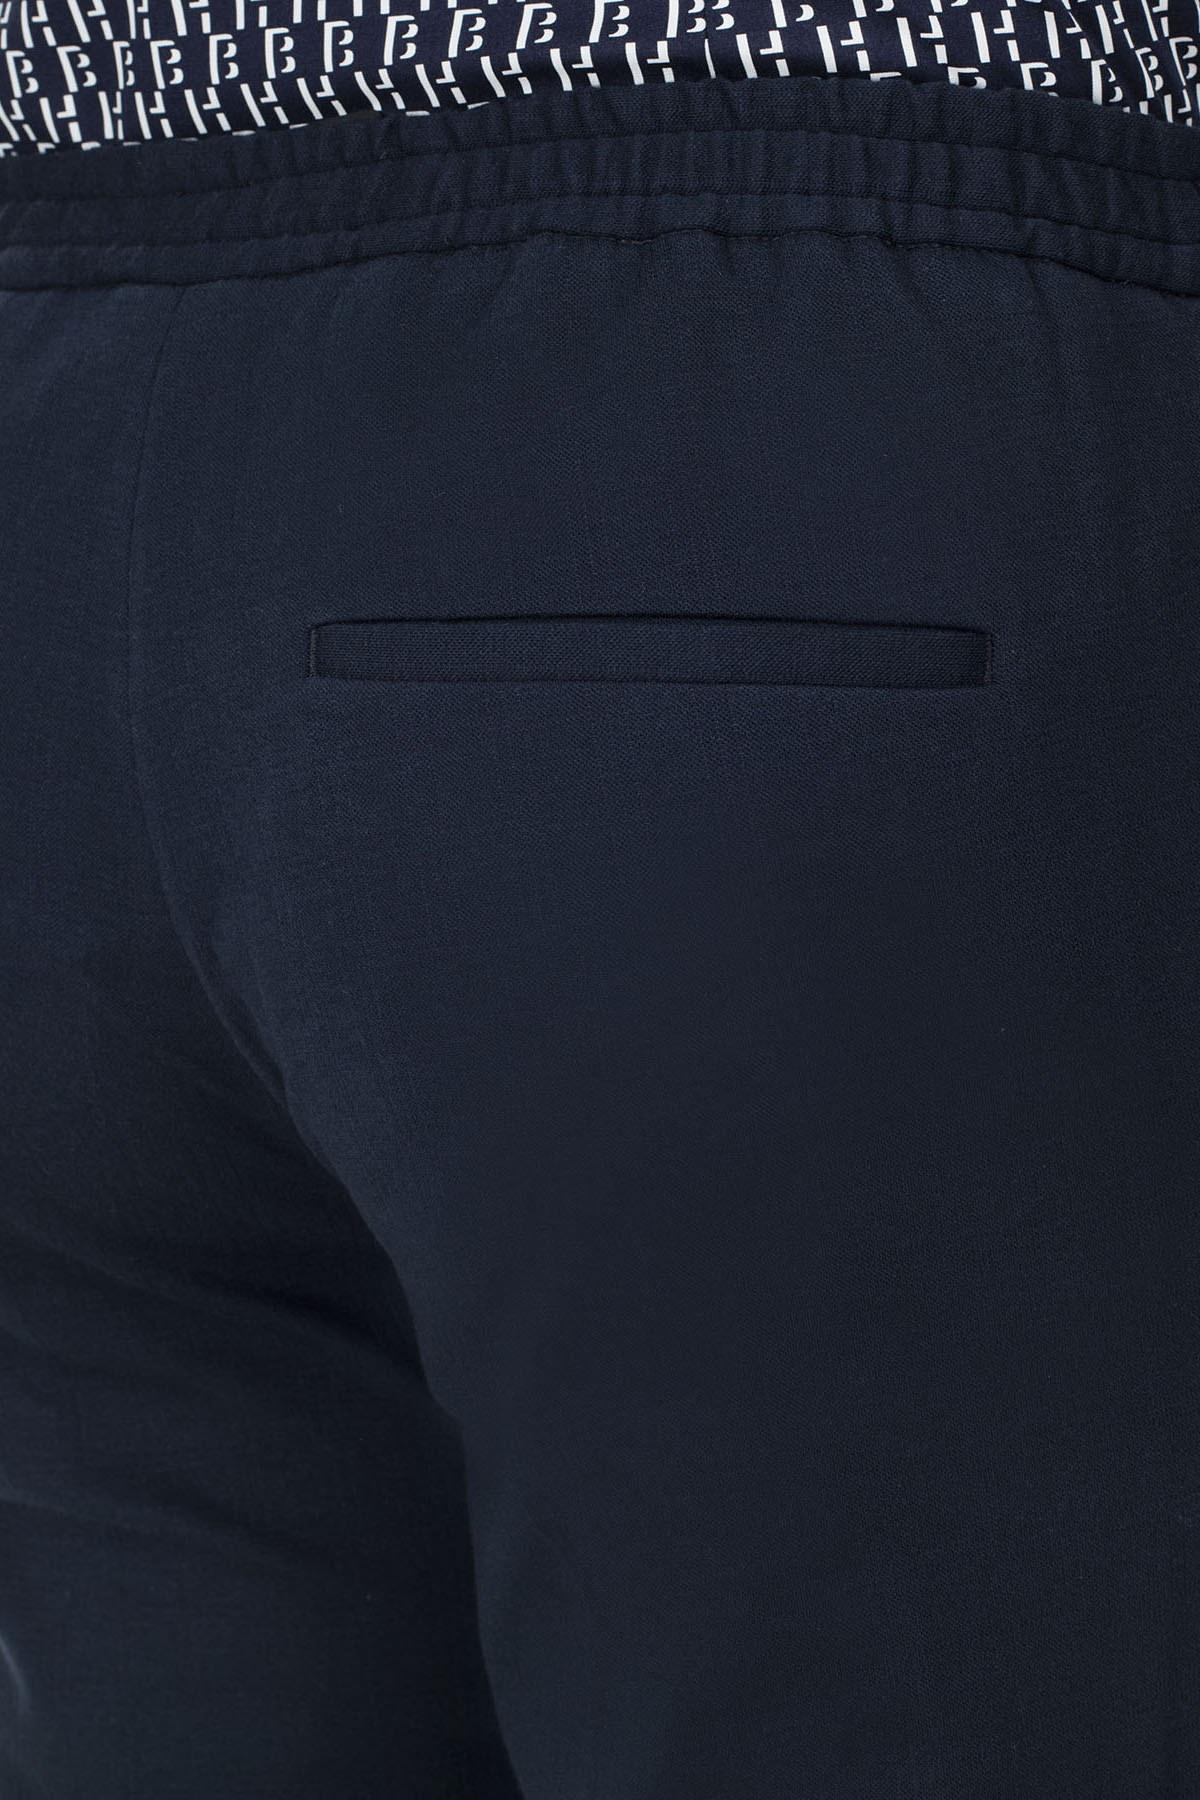 Hugo Boss Slim Fit Erkek Pantolon 50427107 402 LACİVERT